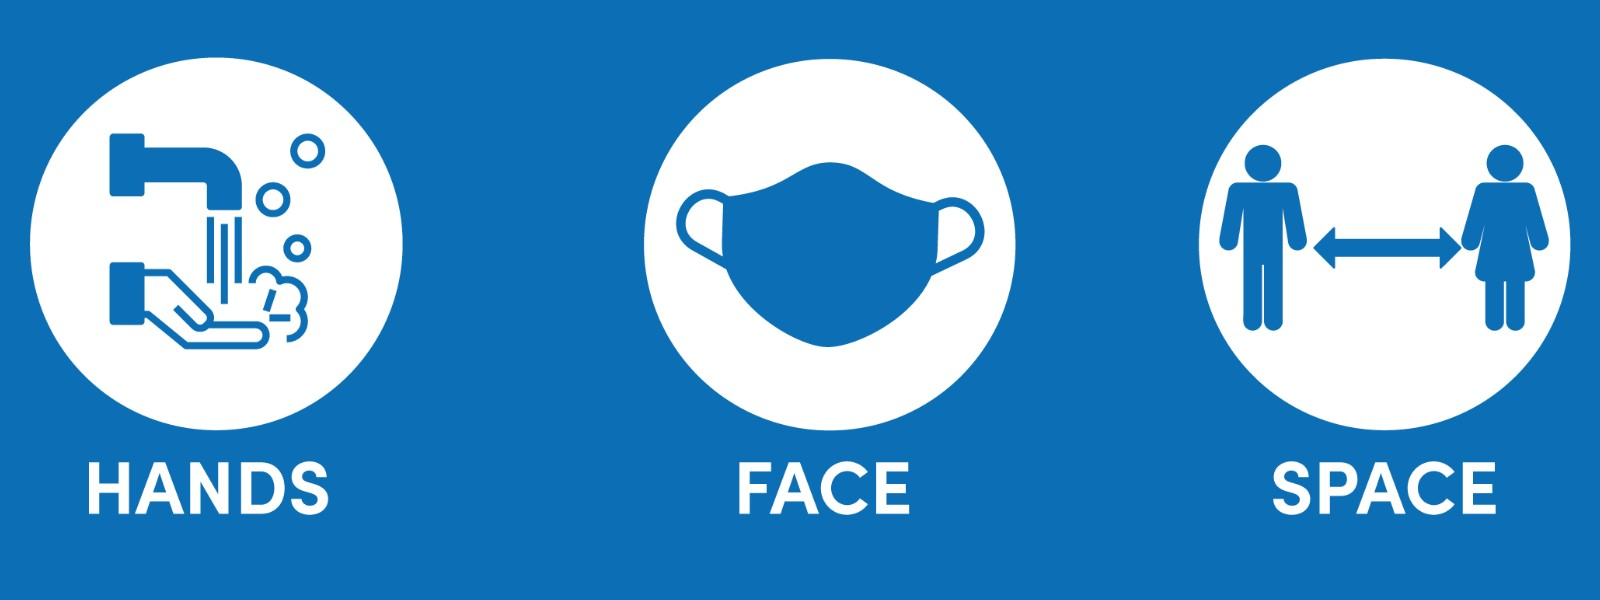 19 people arrested for violating face mask & social distancing regulations